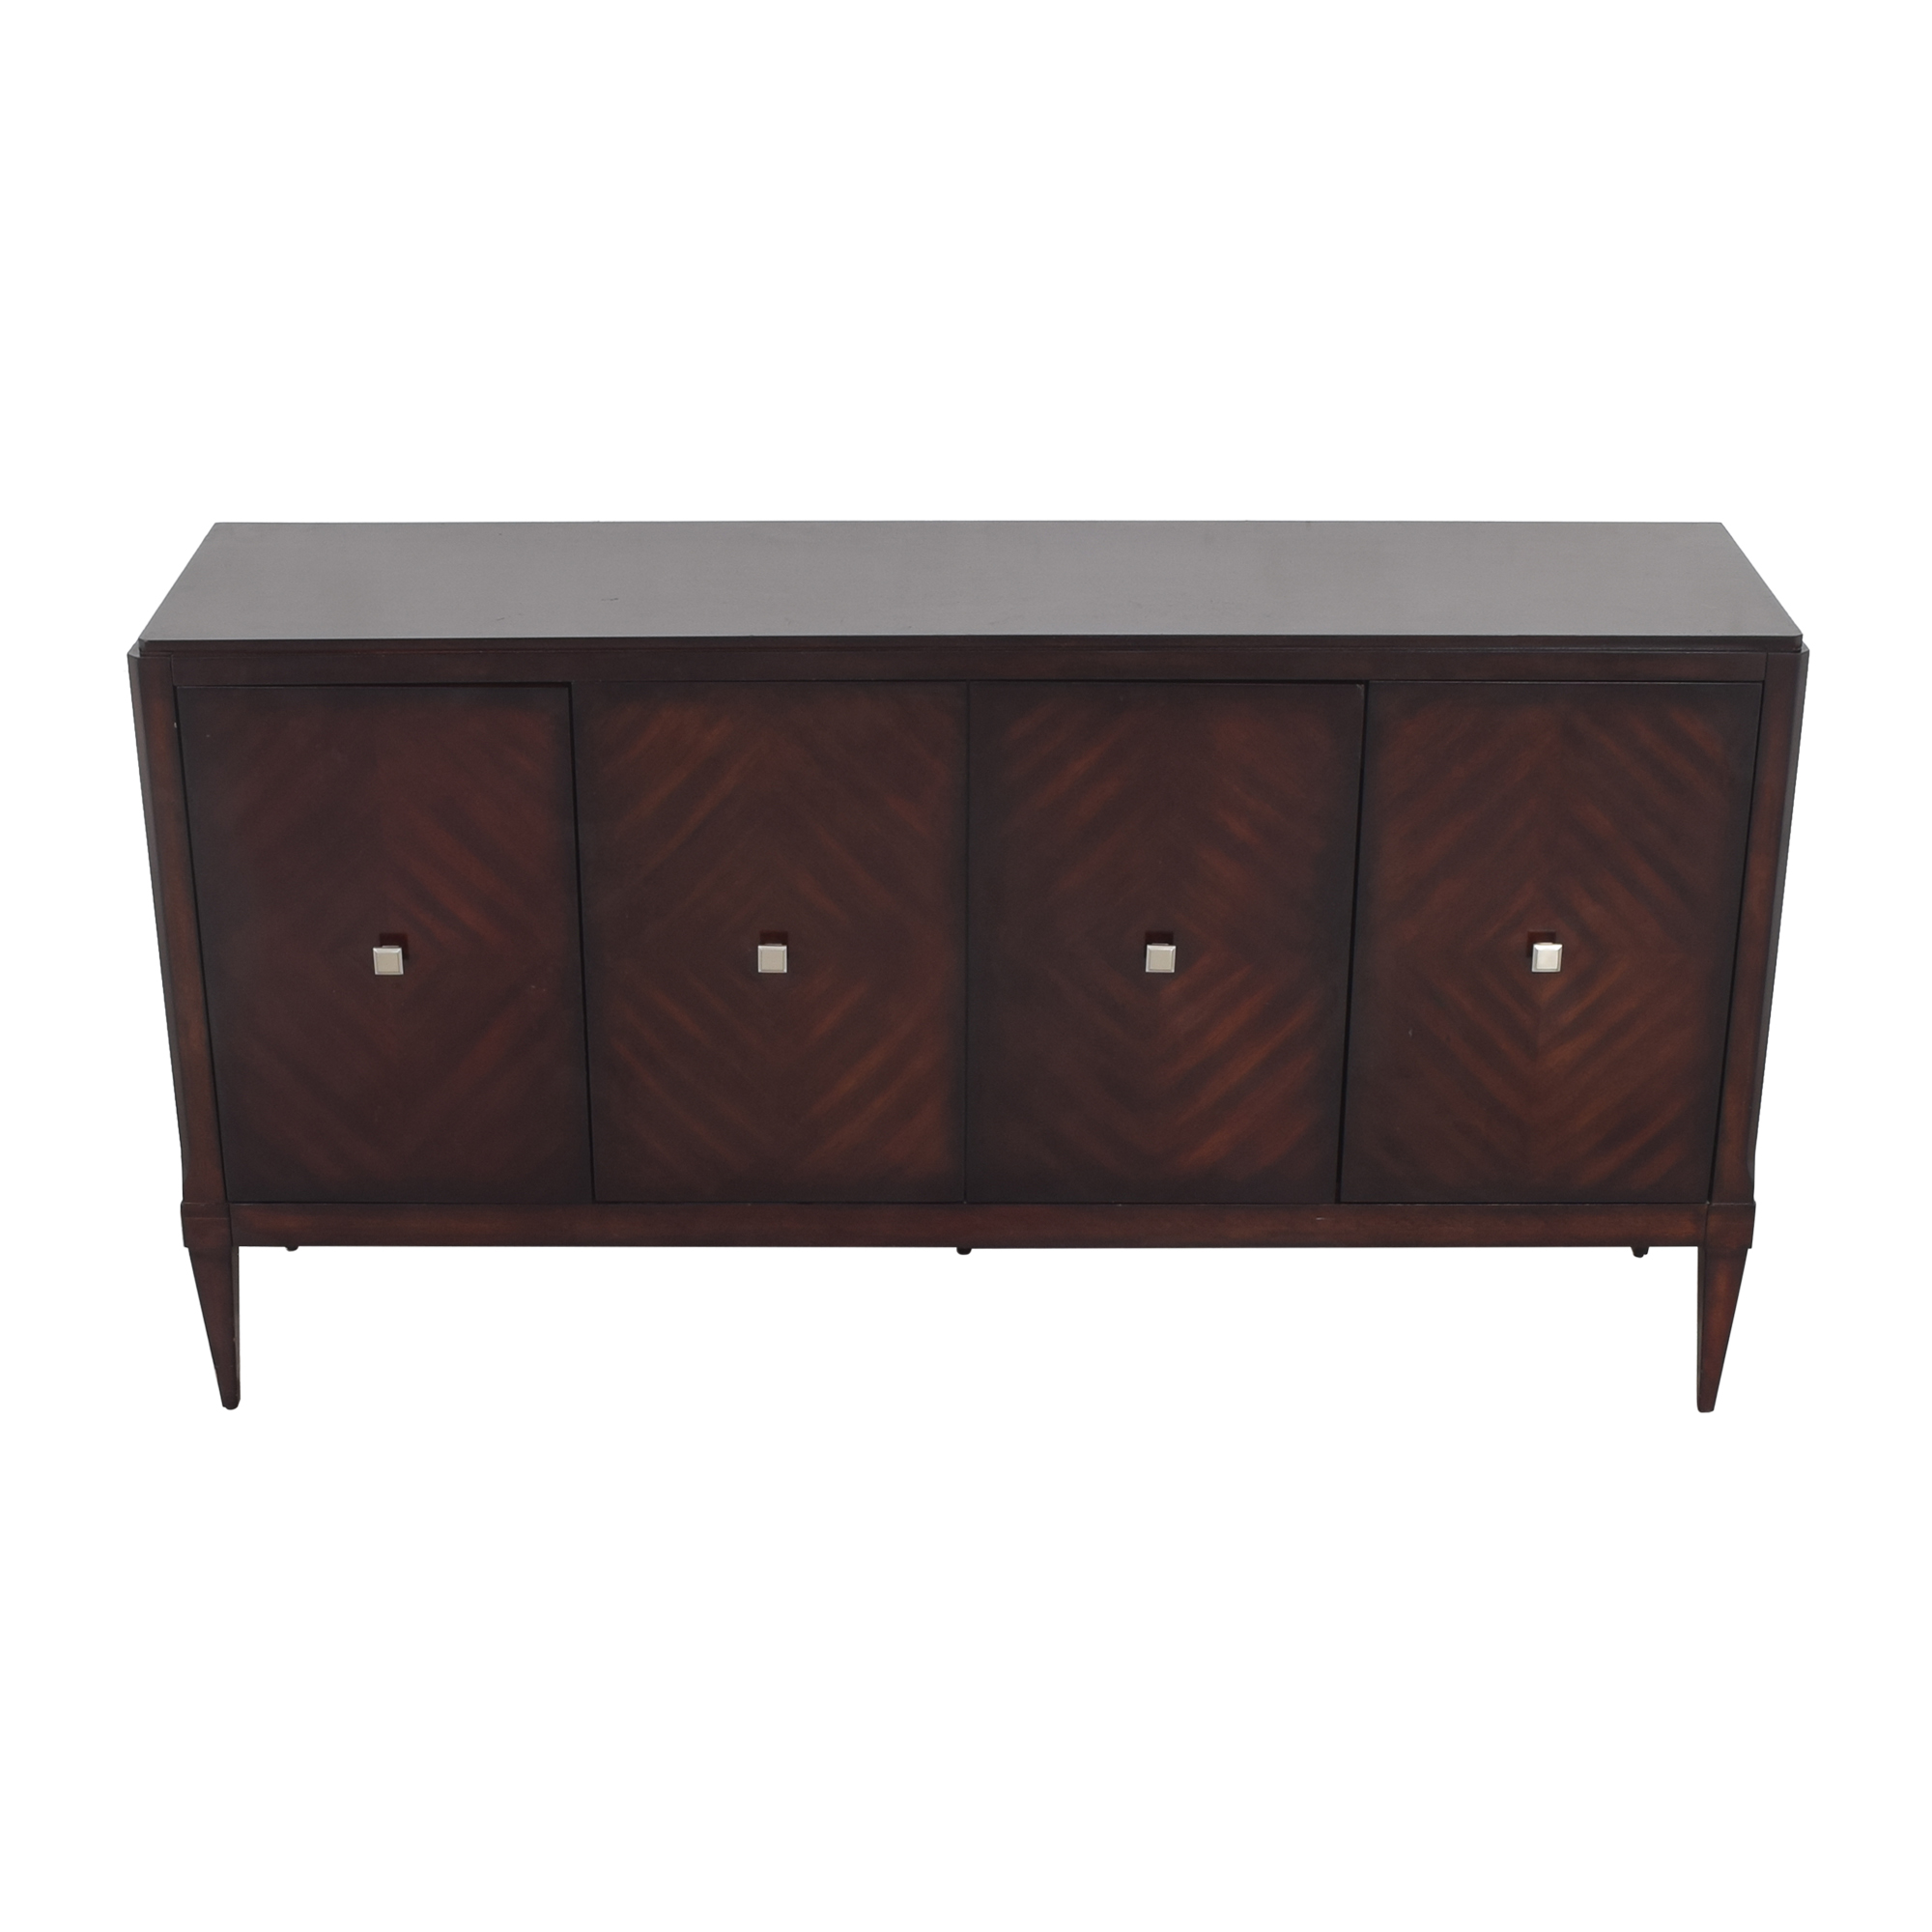 Custom Four Door Sideboard / Cabinets & Sideboards